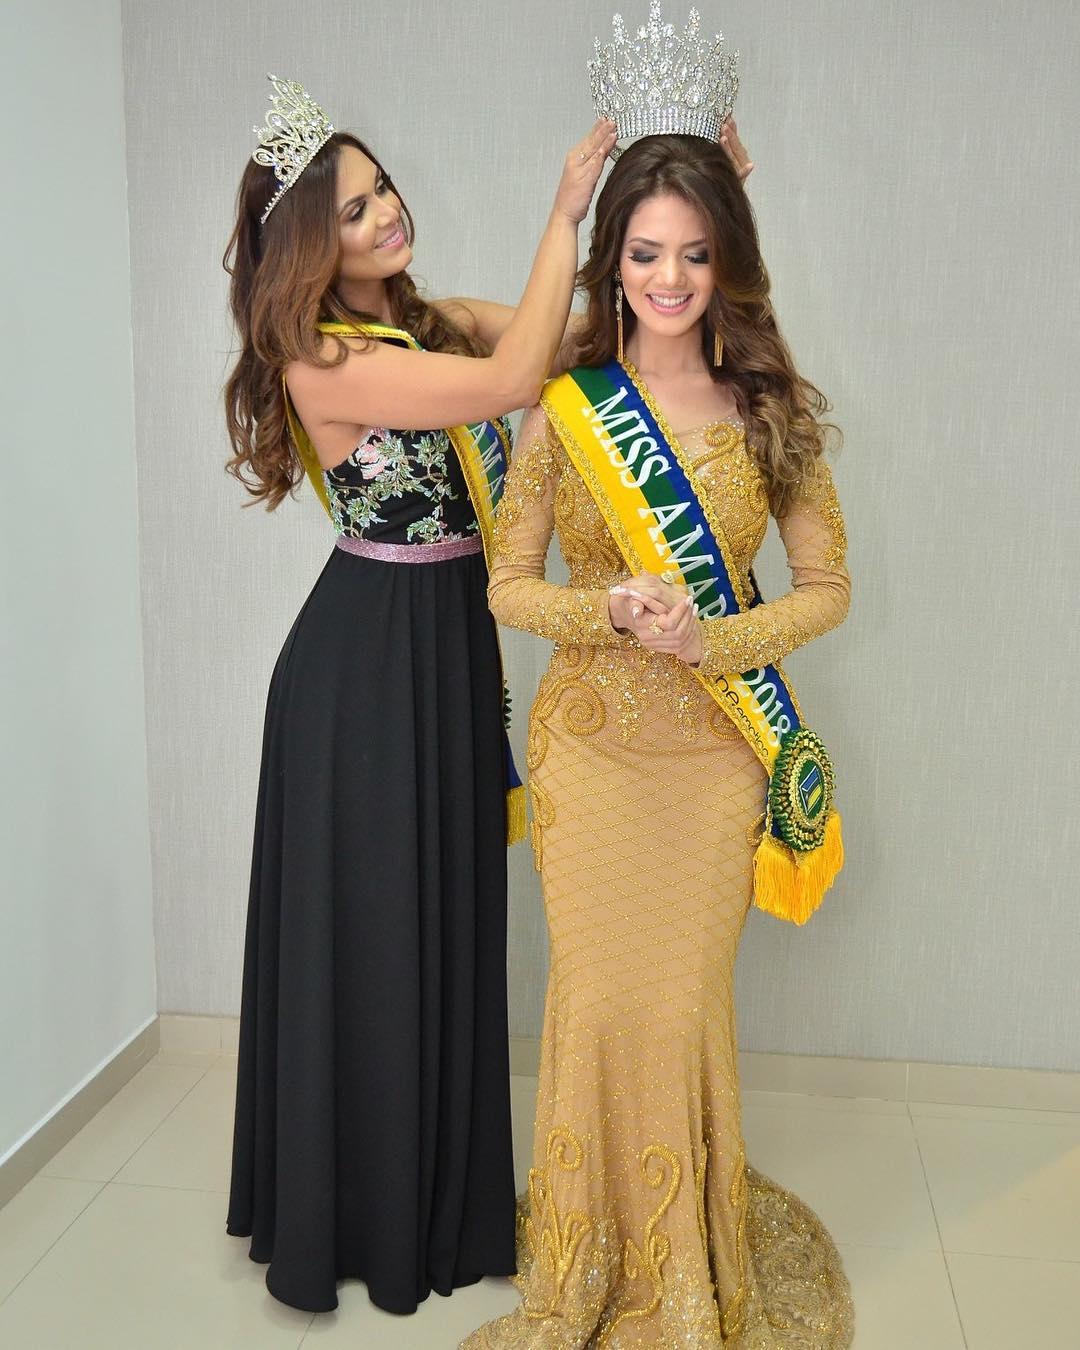 williene lima, miss amapa universo 2018. - Página 2 30077612